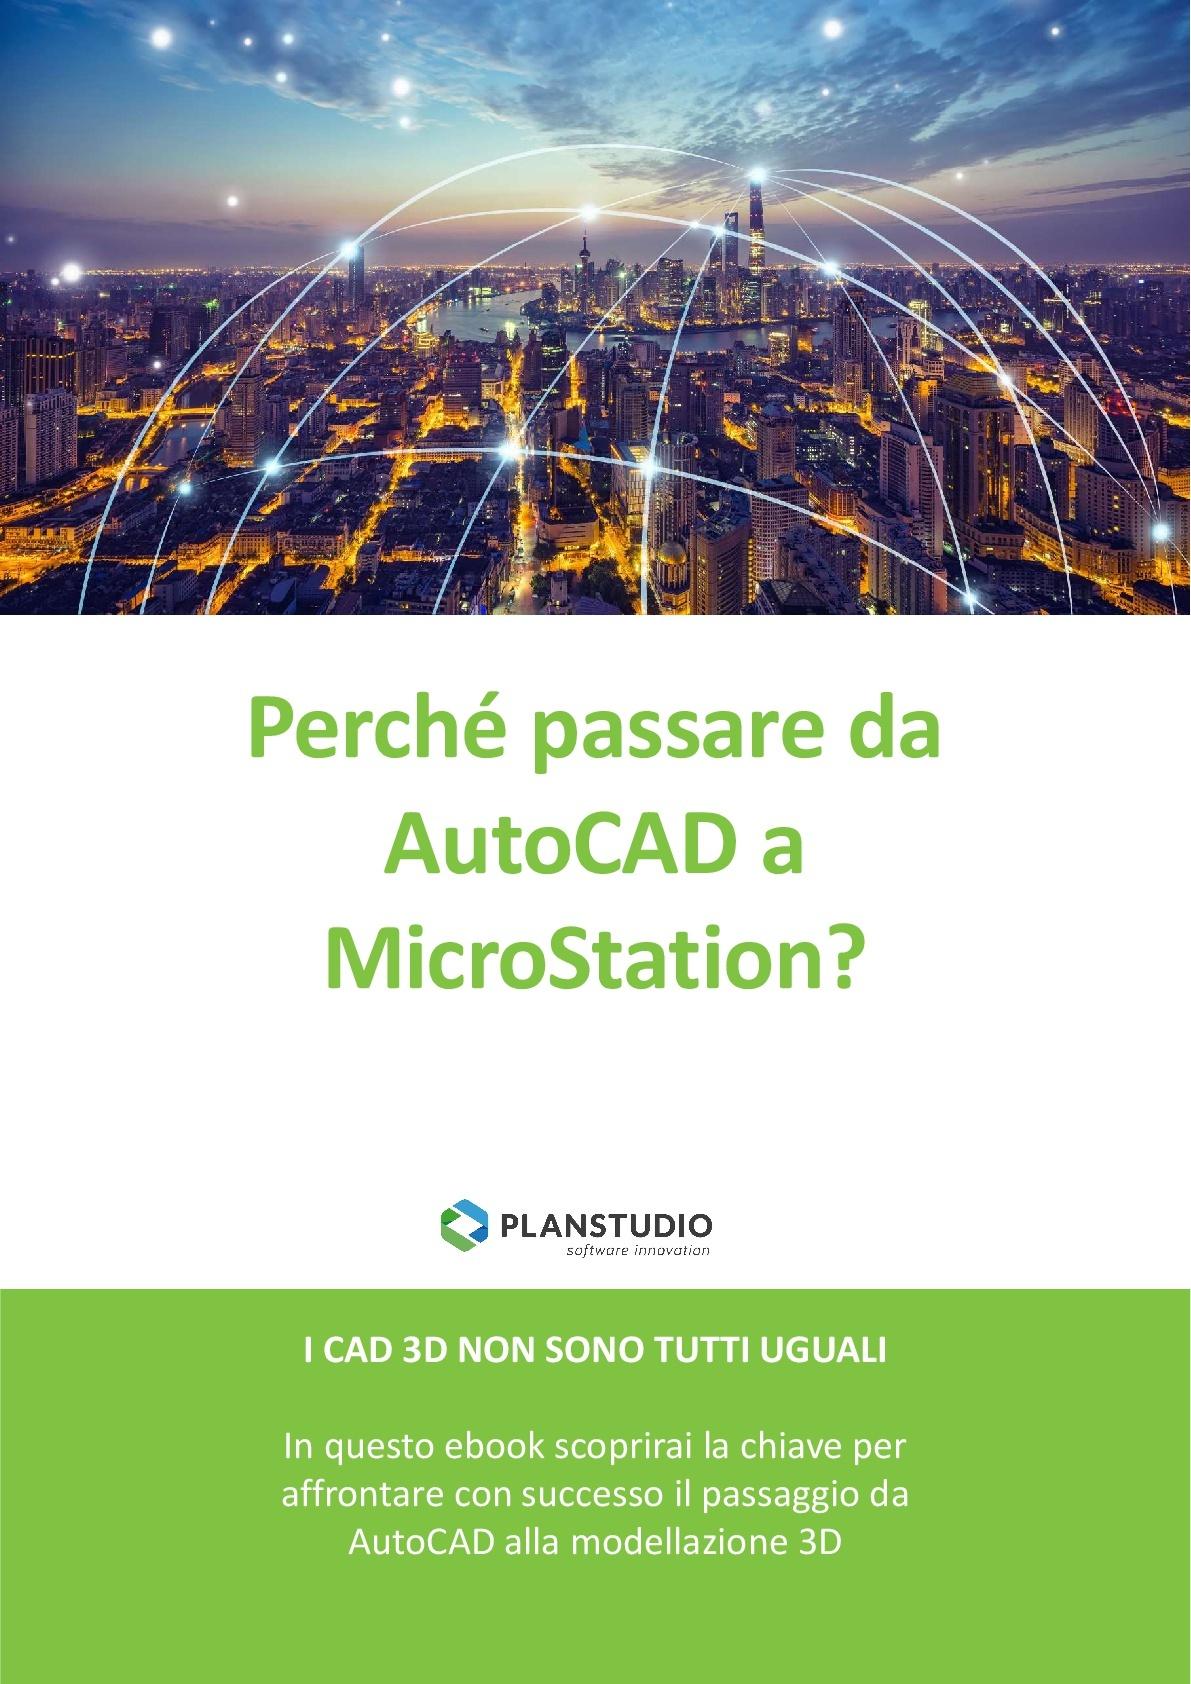 copertina - Perché passare da Autocad a MicroStation - Ebook-copy-1-001.jpg